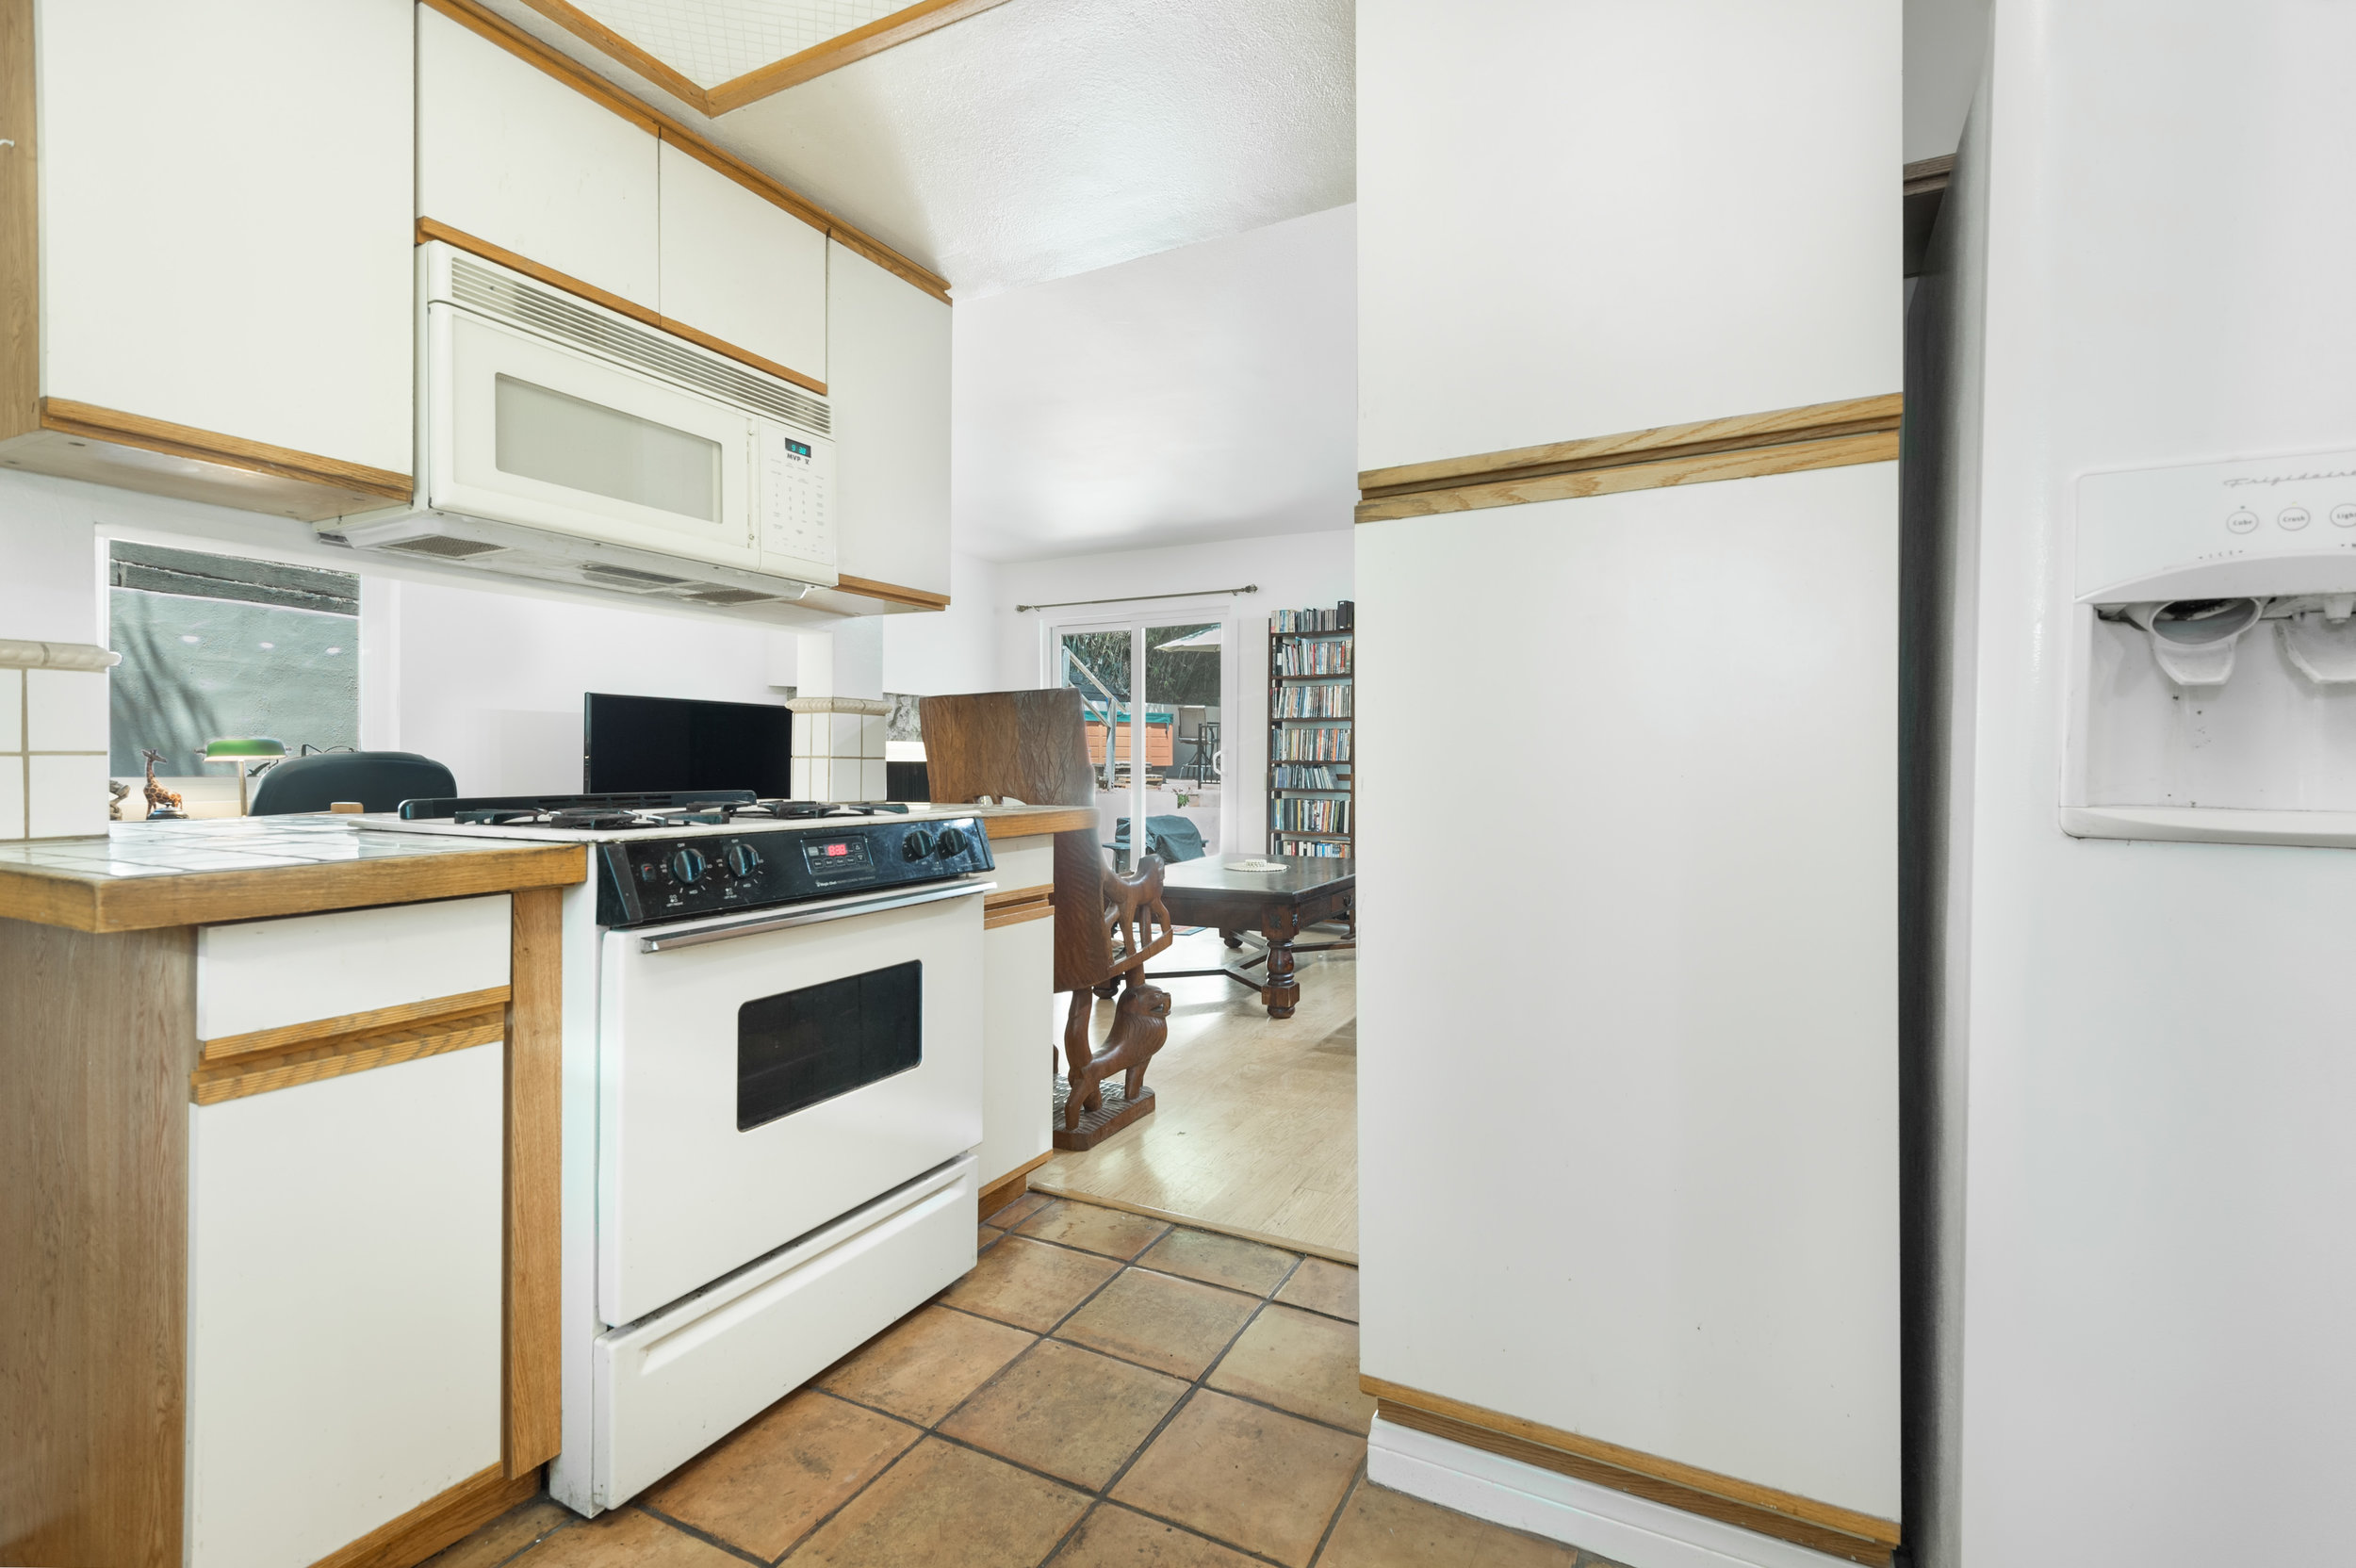 024 Kitchen 15072 Rayneta Sherman Oaks For Sale The Malibu Life Team Luxury Real Estate.jpg